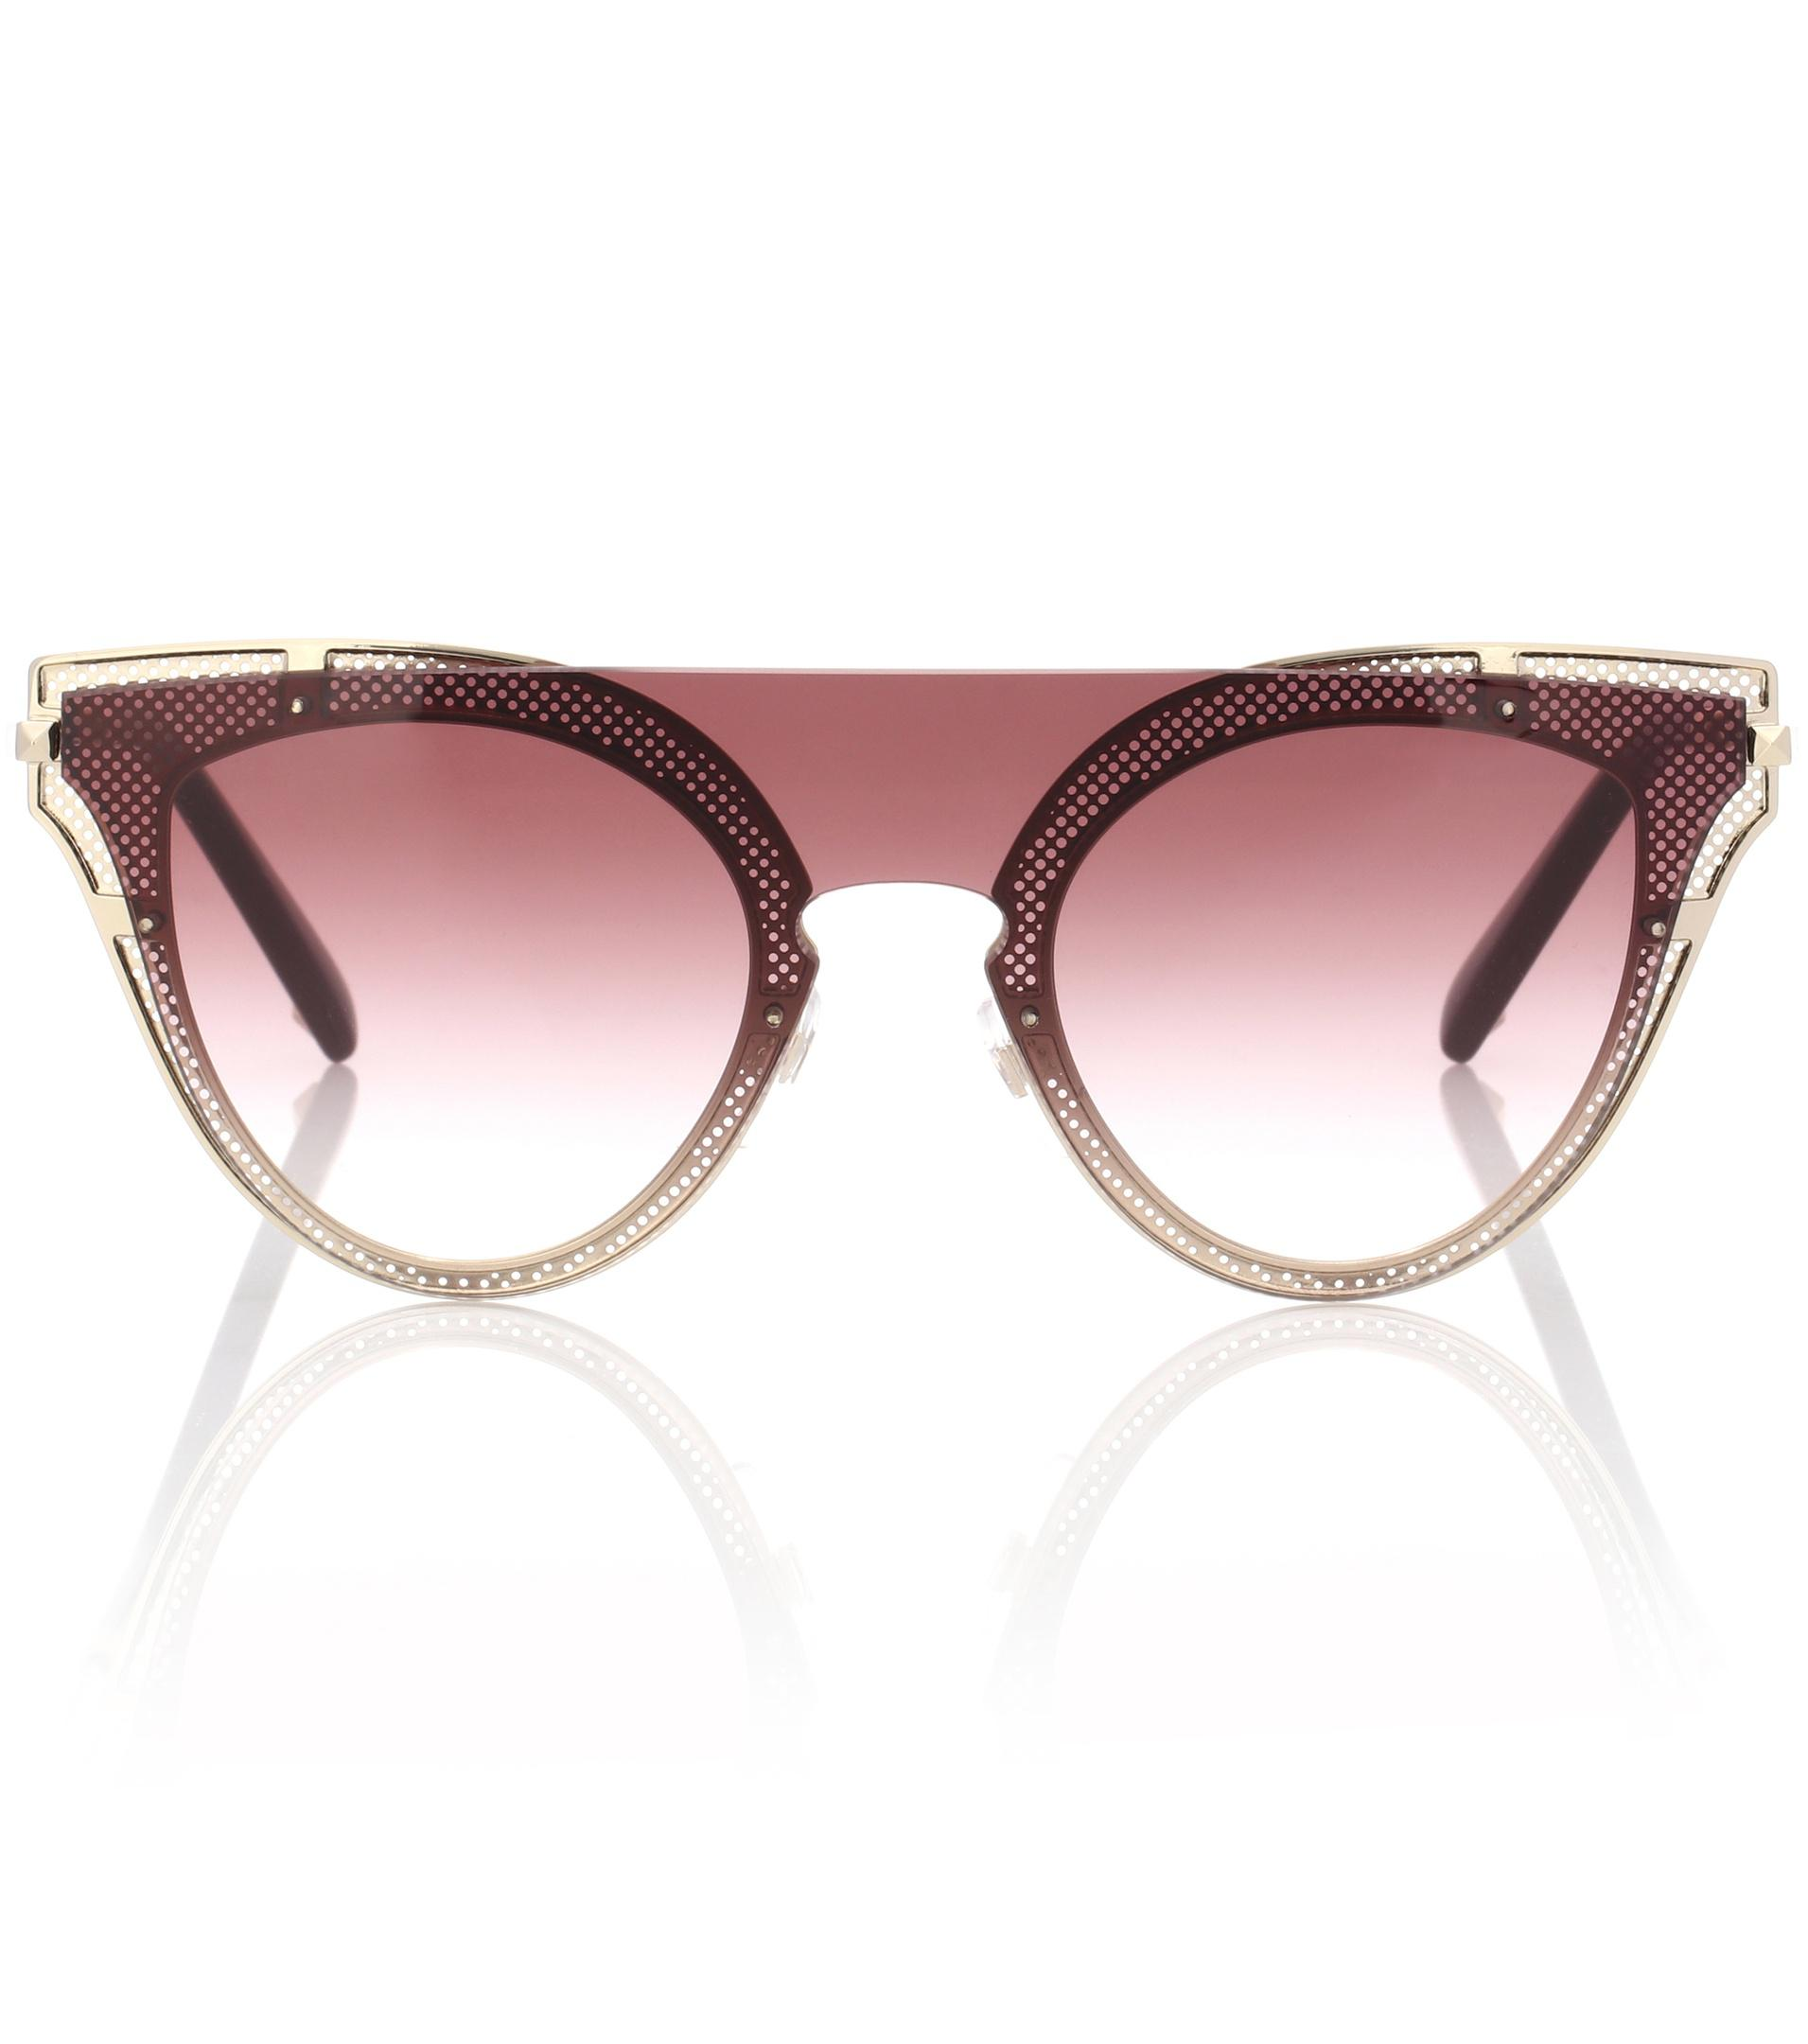 Garavani cat-eye sunglasses Valentino 4facvHI9c